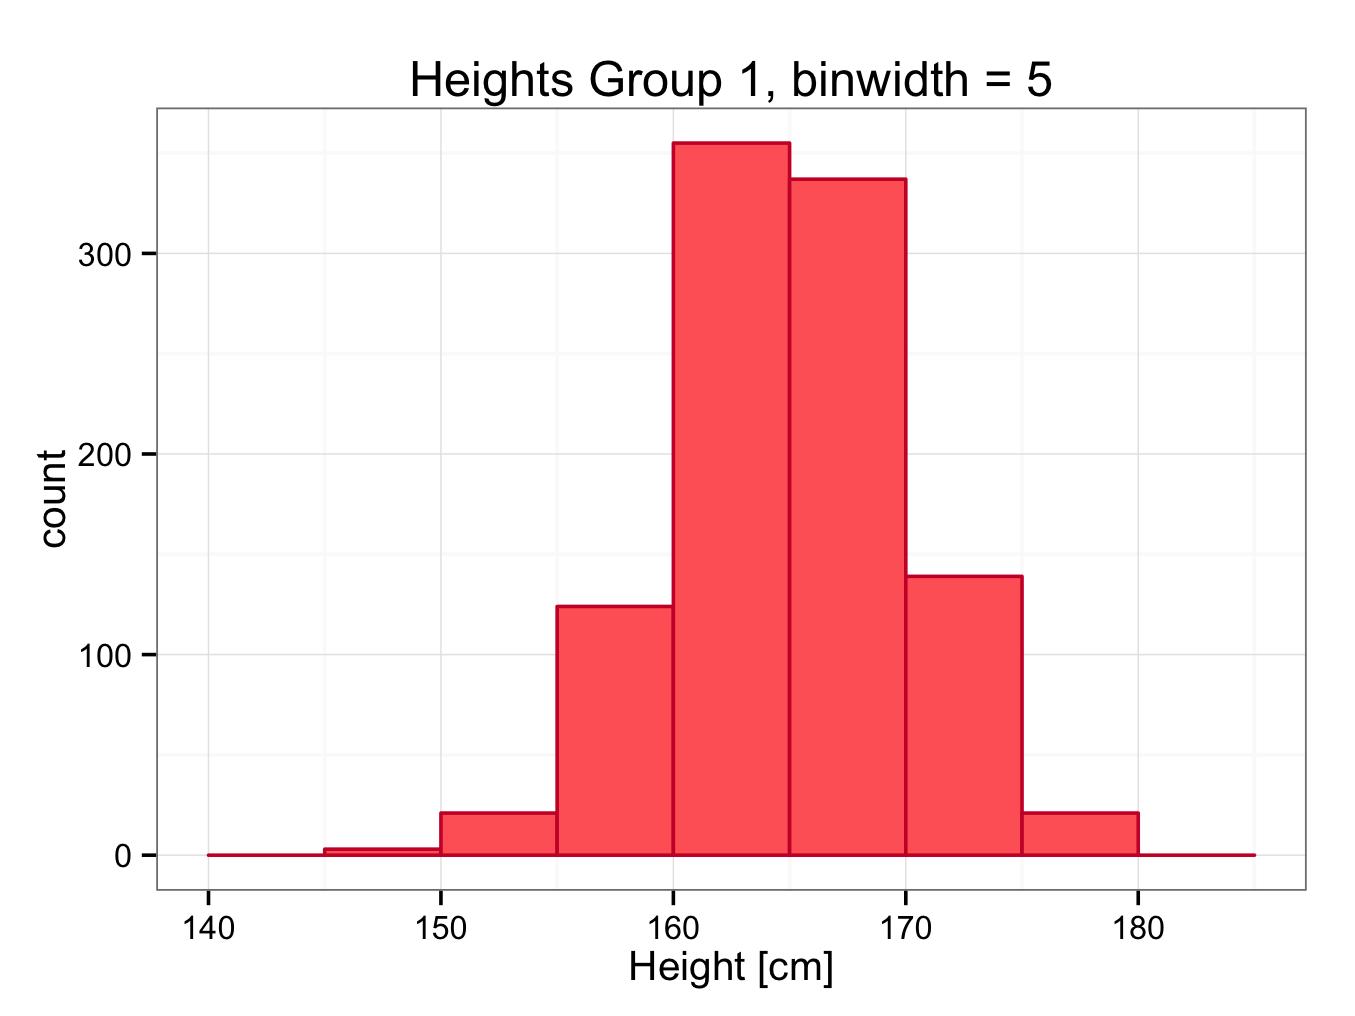 heightgroup1bin5